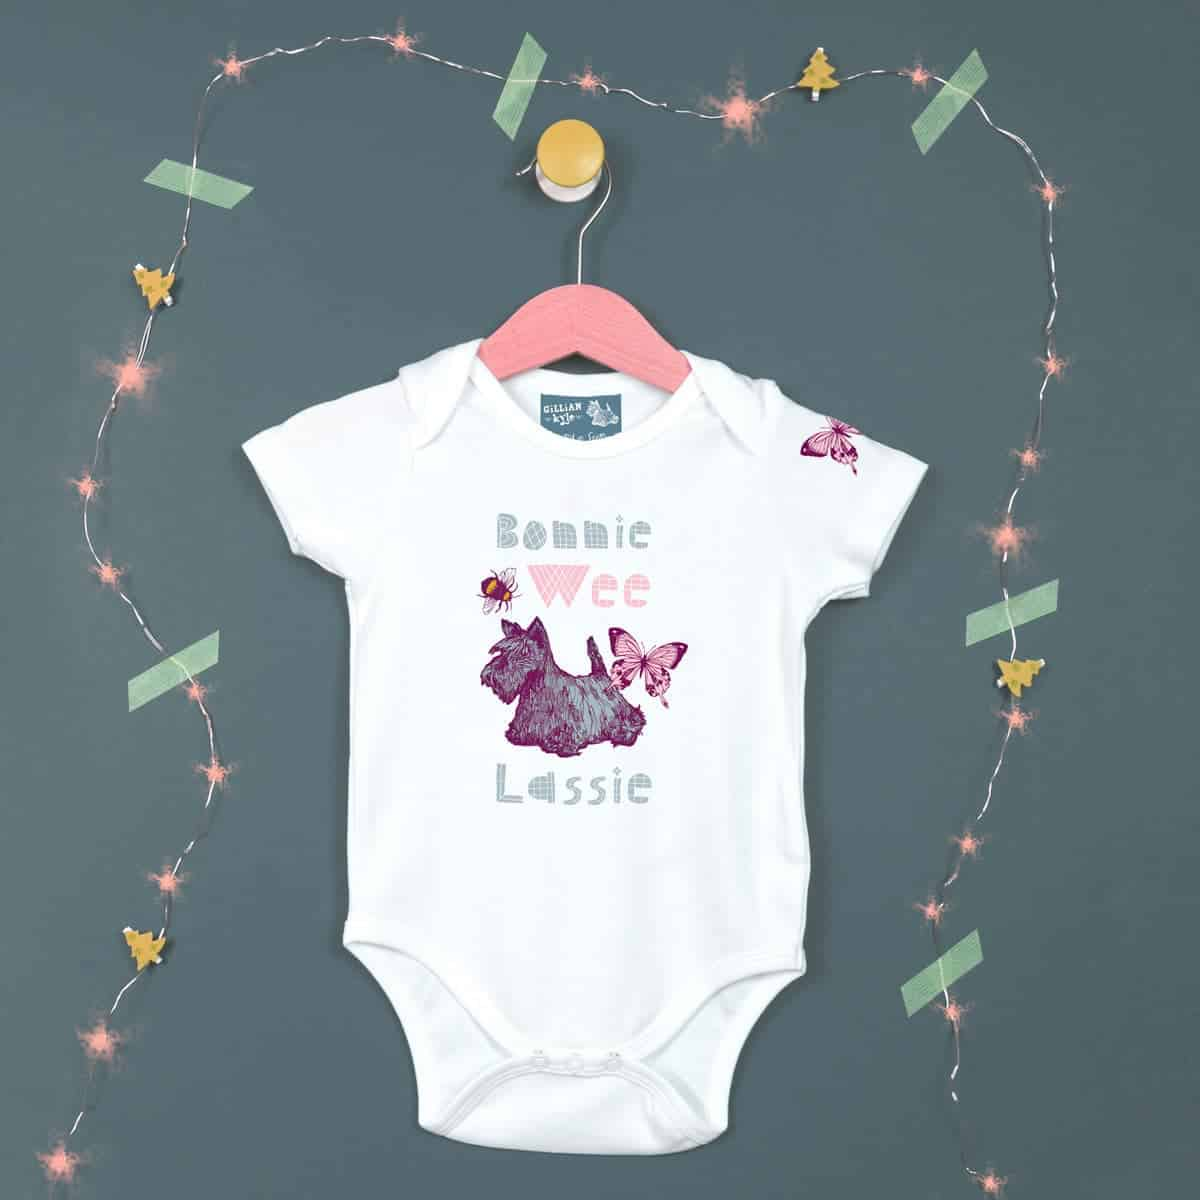 Gillian Kyle, Scottish baby clothing, Scottish Baby gift, Scottish bonnie wee lassie range